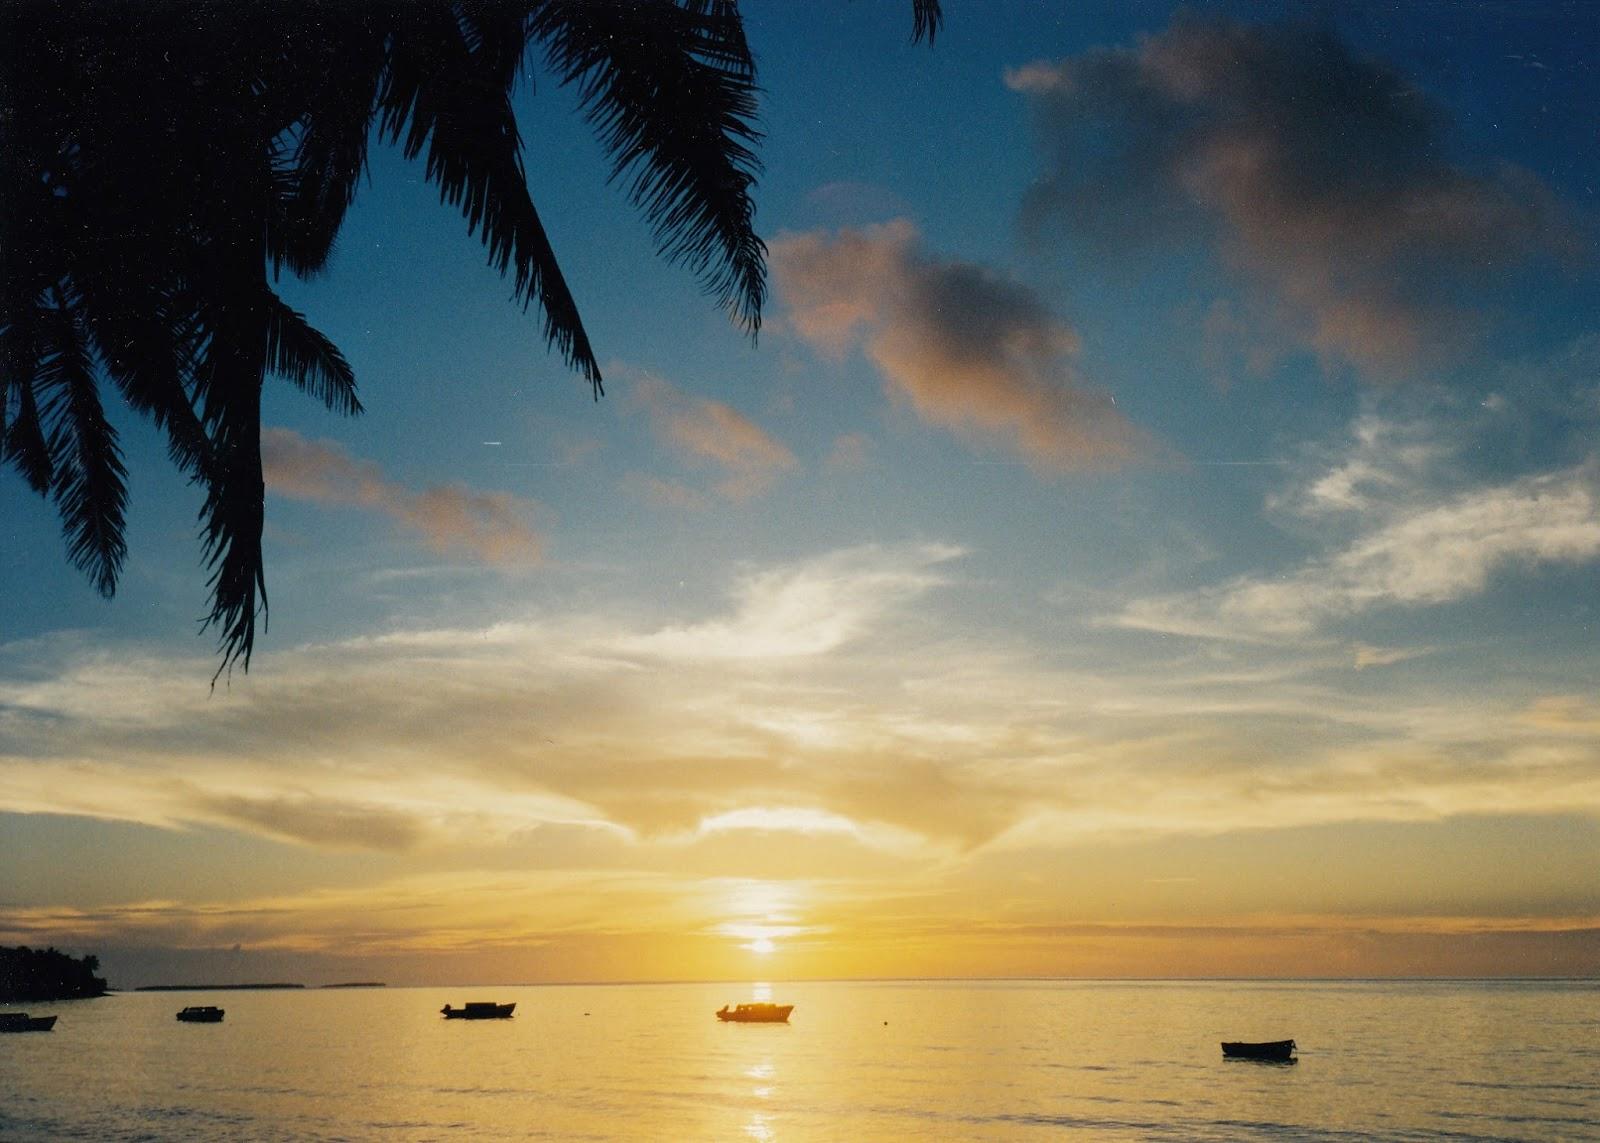 Tonga travel brings a beautiful sunset